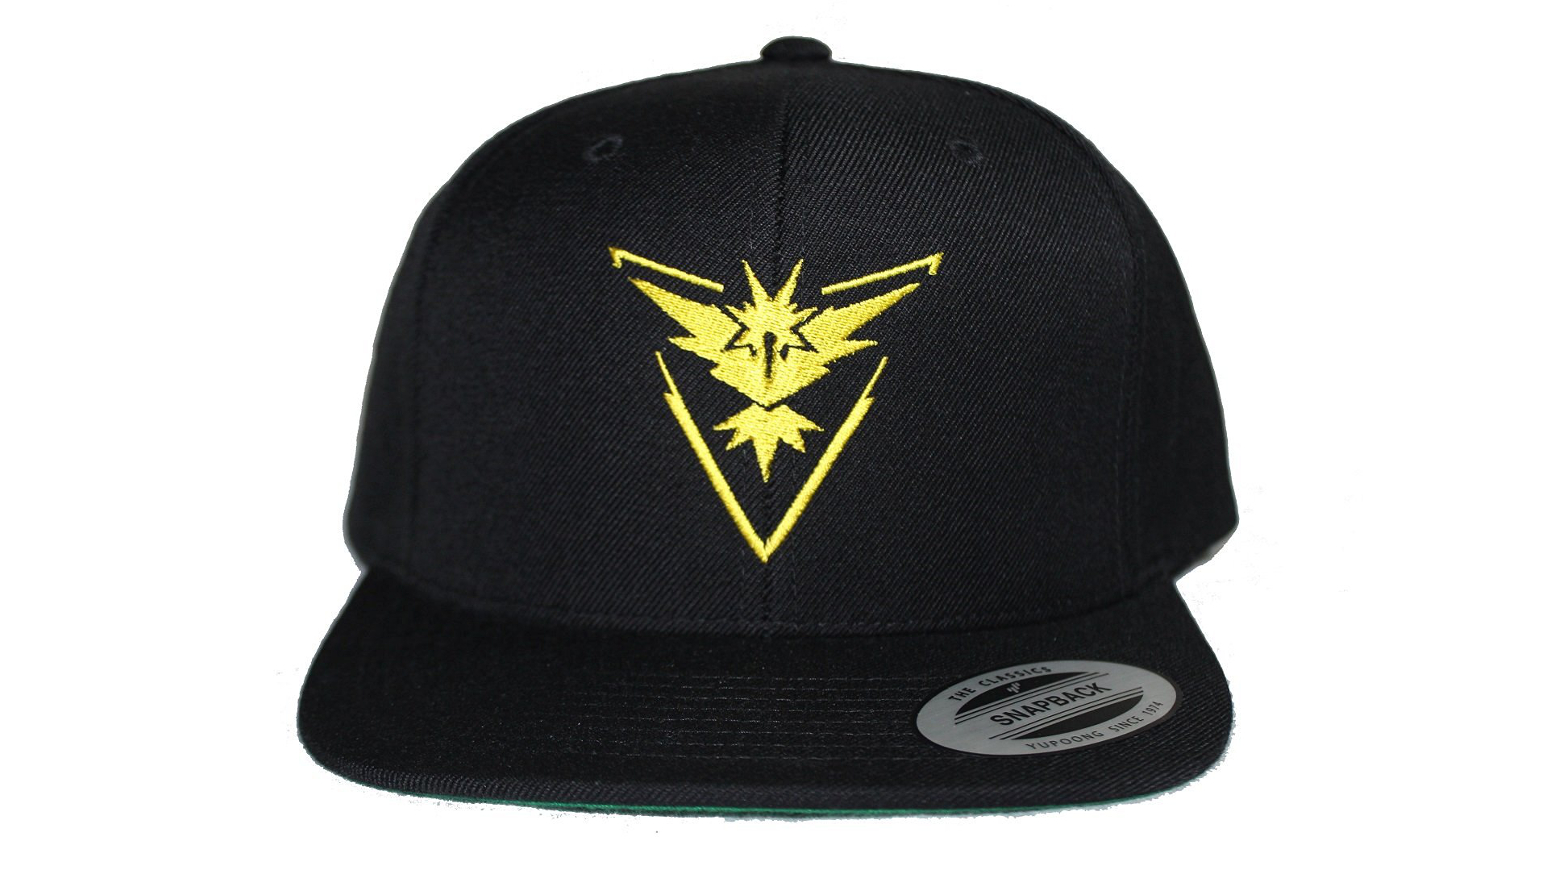 pokemon go, pokemon go team instinct, team instinct, team instinct shirts, team instinct hats, team instinct merchandise, pokemon go merchandise, pokemon go teams, pokemon go guide